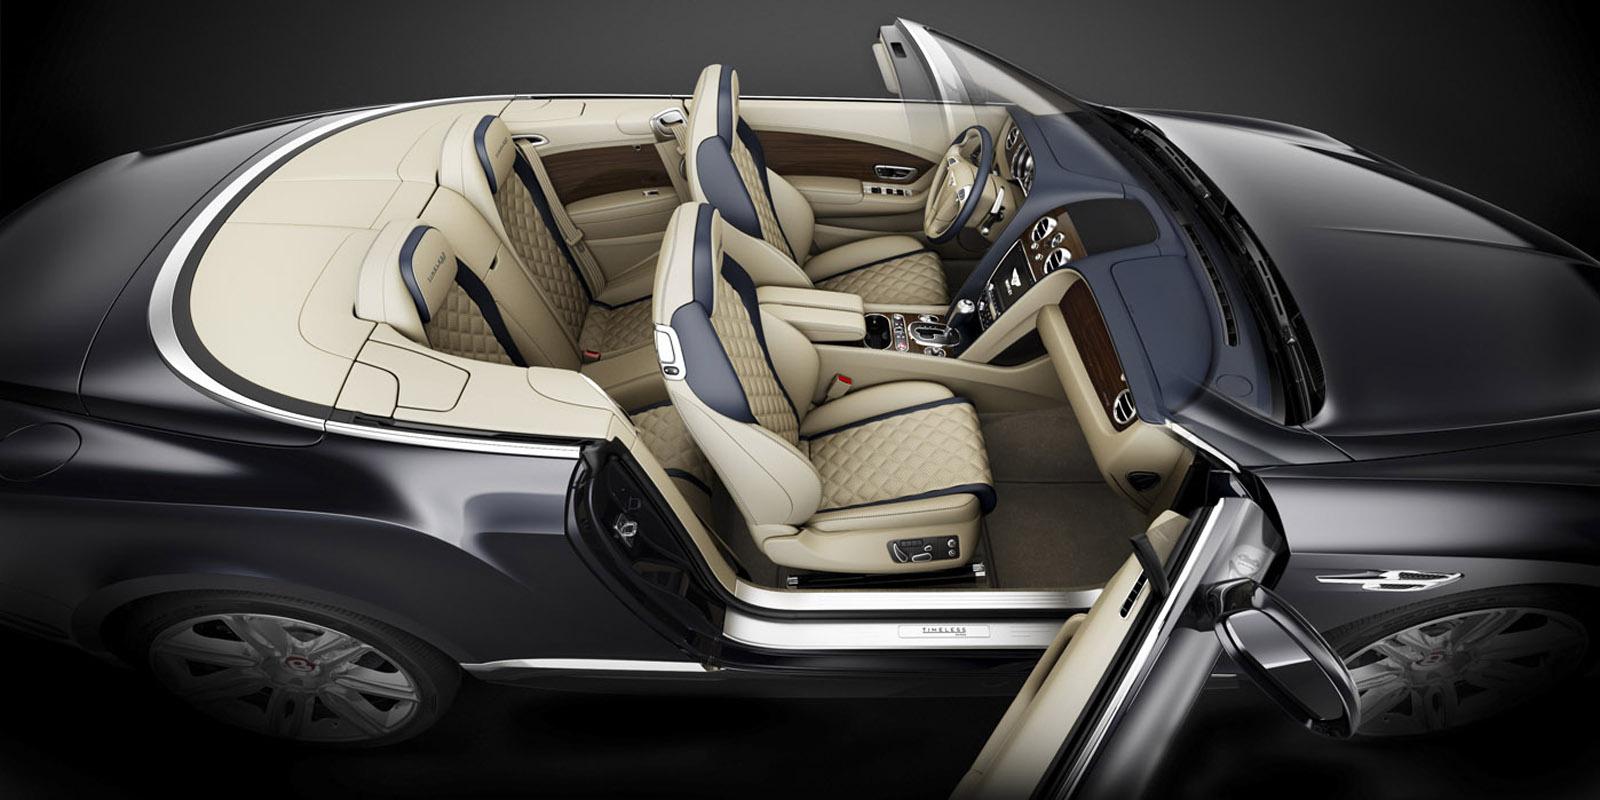 Bentley_Continental_GTC_Timeless_Series_03